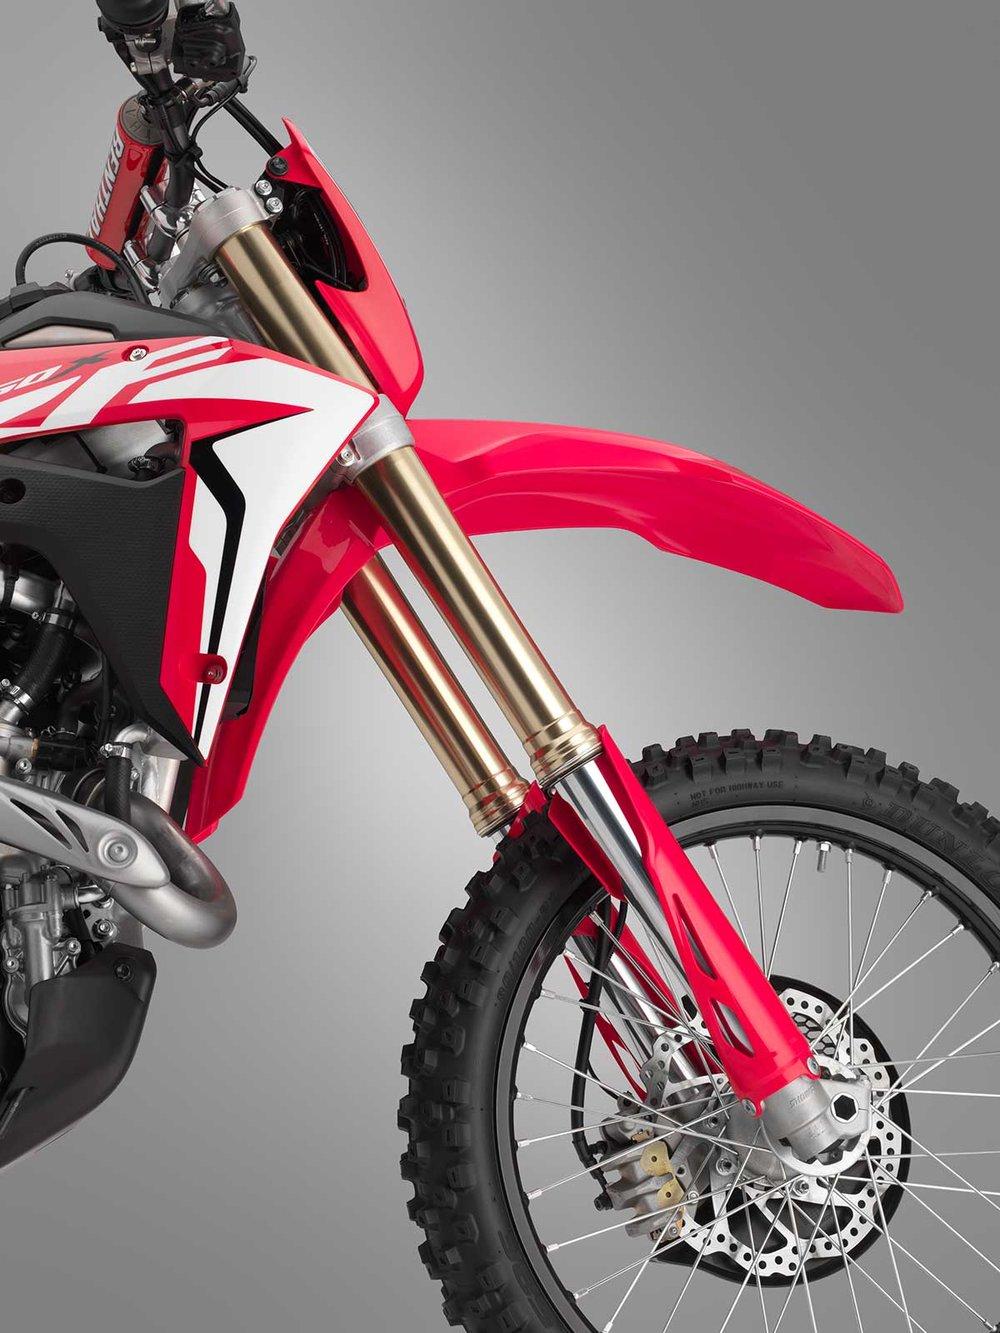 19-Honda-CRF450X_fork.jpg